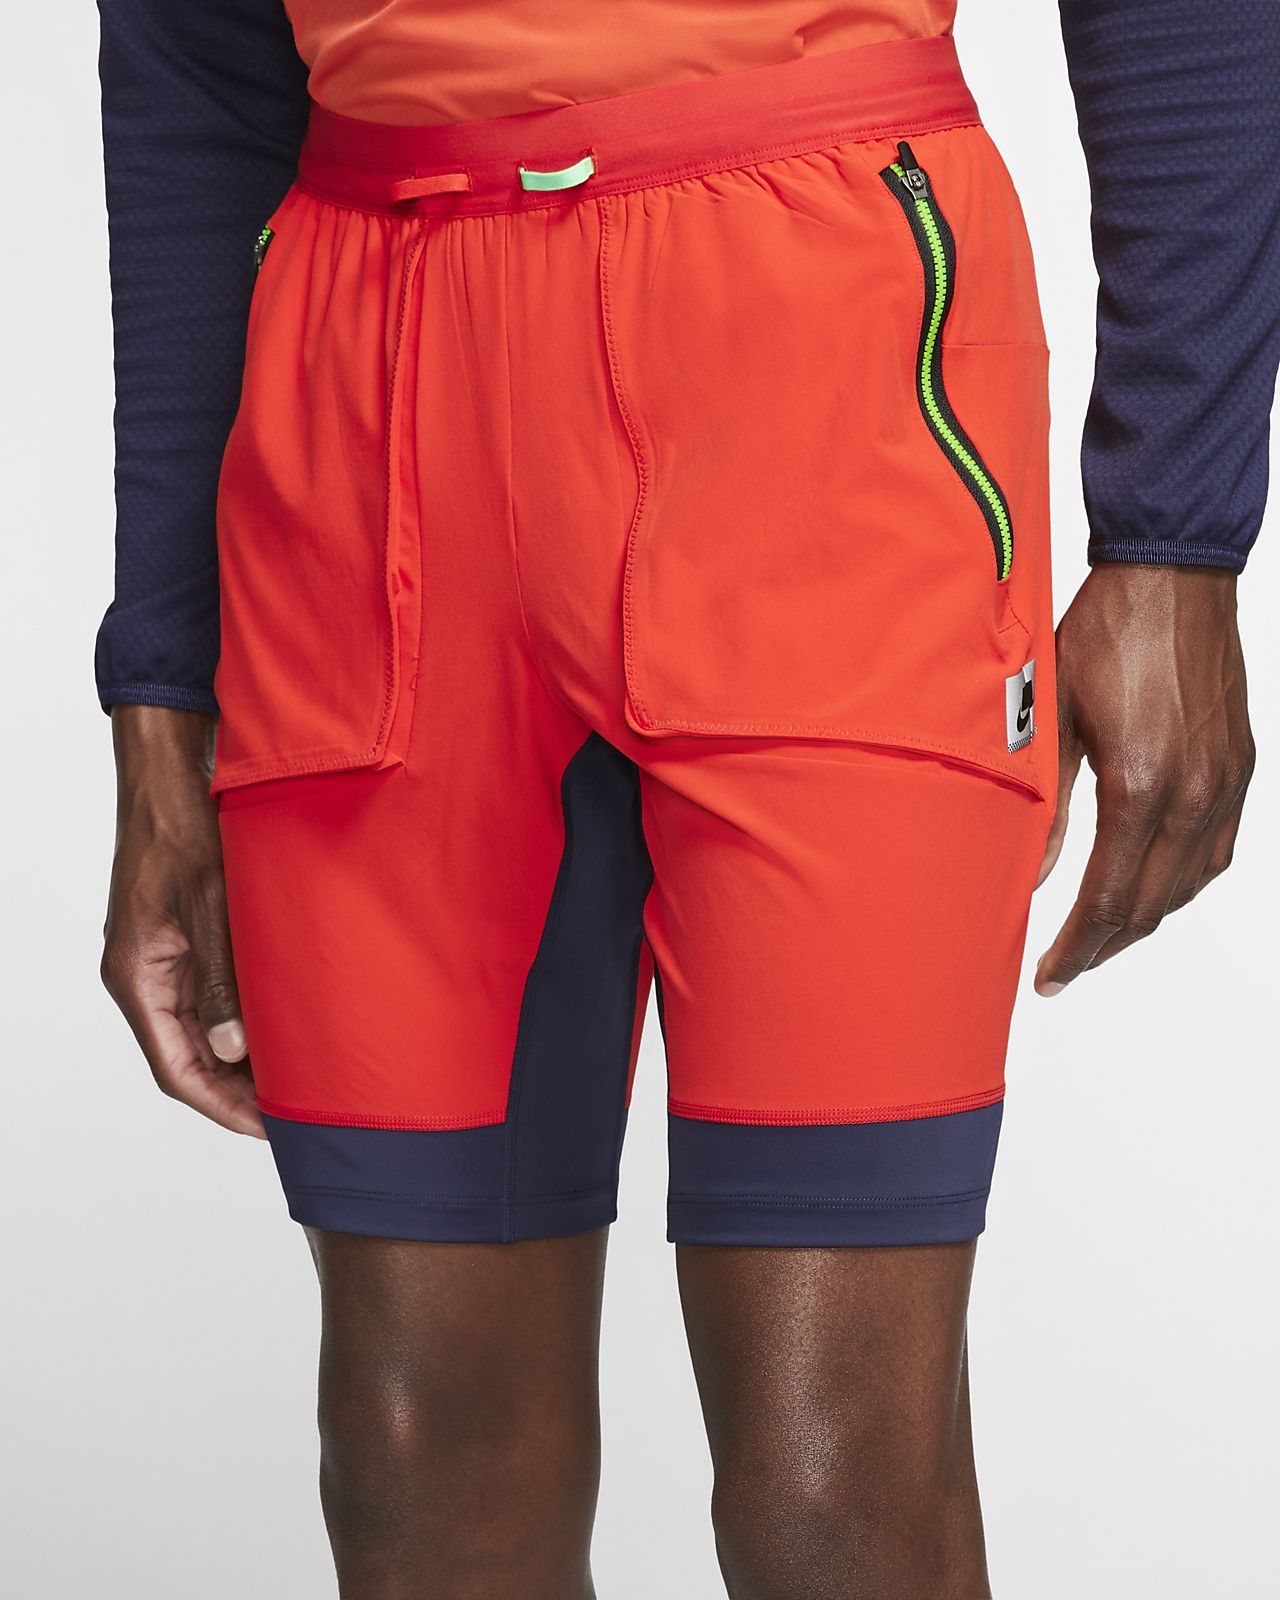 Hybrid Nike Running Wild Men's Shorts Run eEIYDH92W